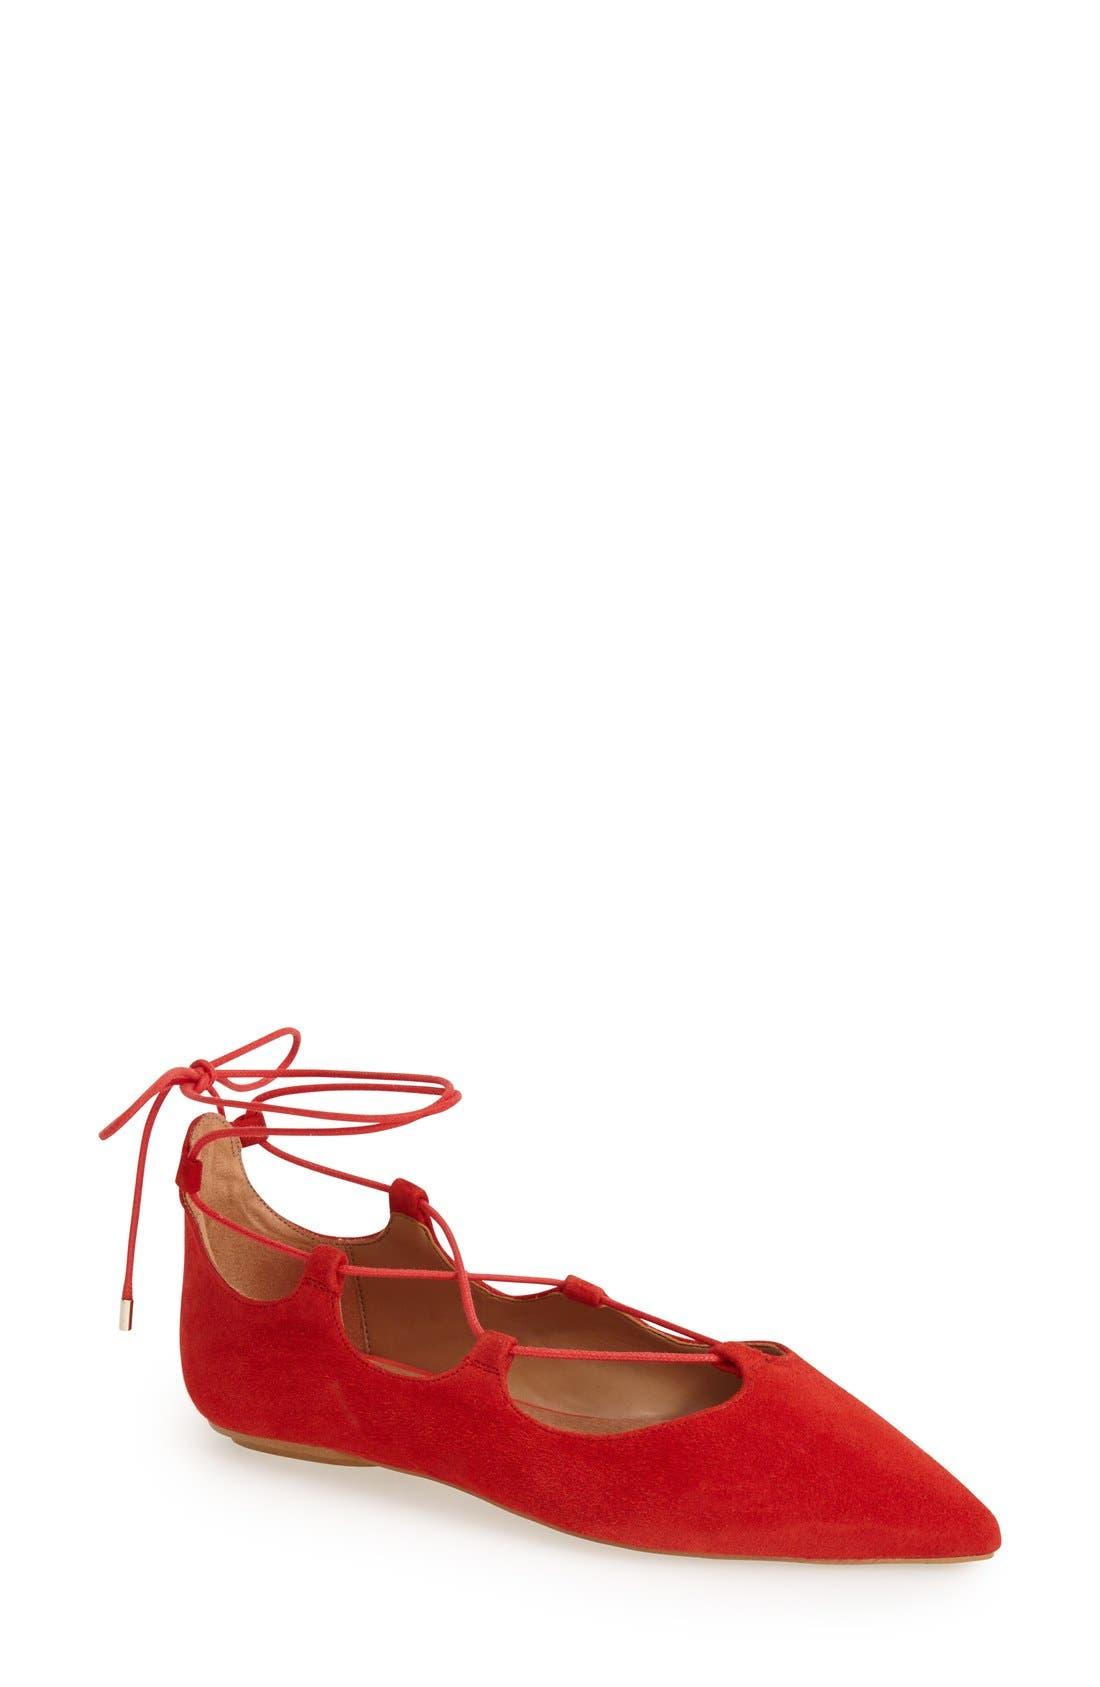 Main Image - Topshop 'Leather Kingdom' Pointy Toe Flat (Women)